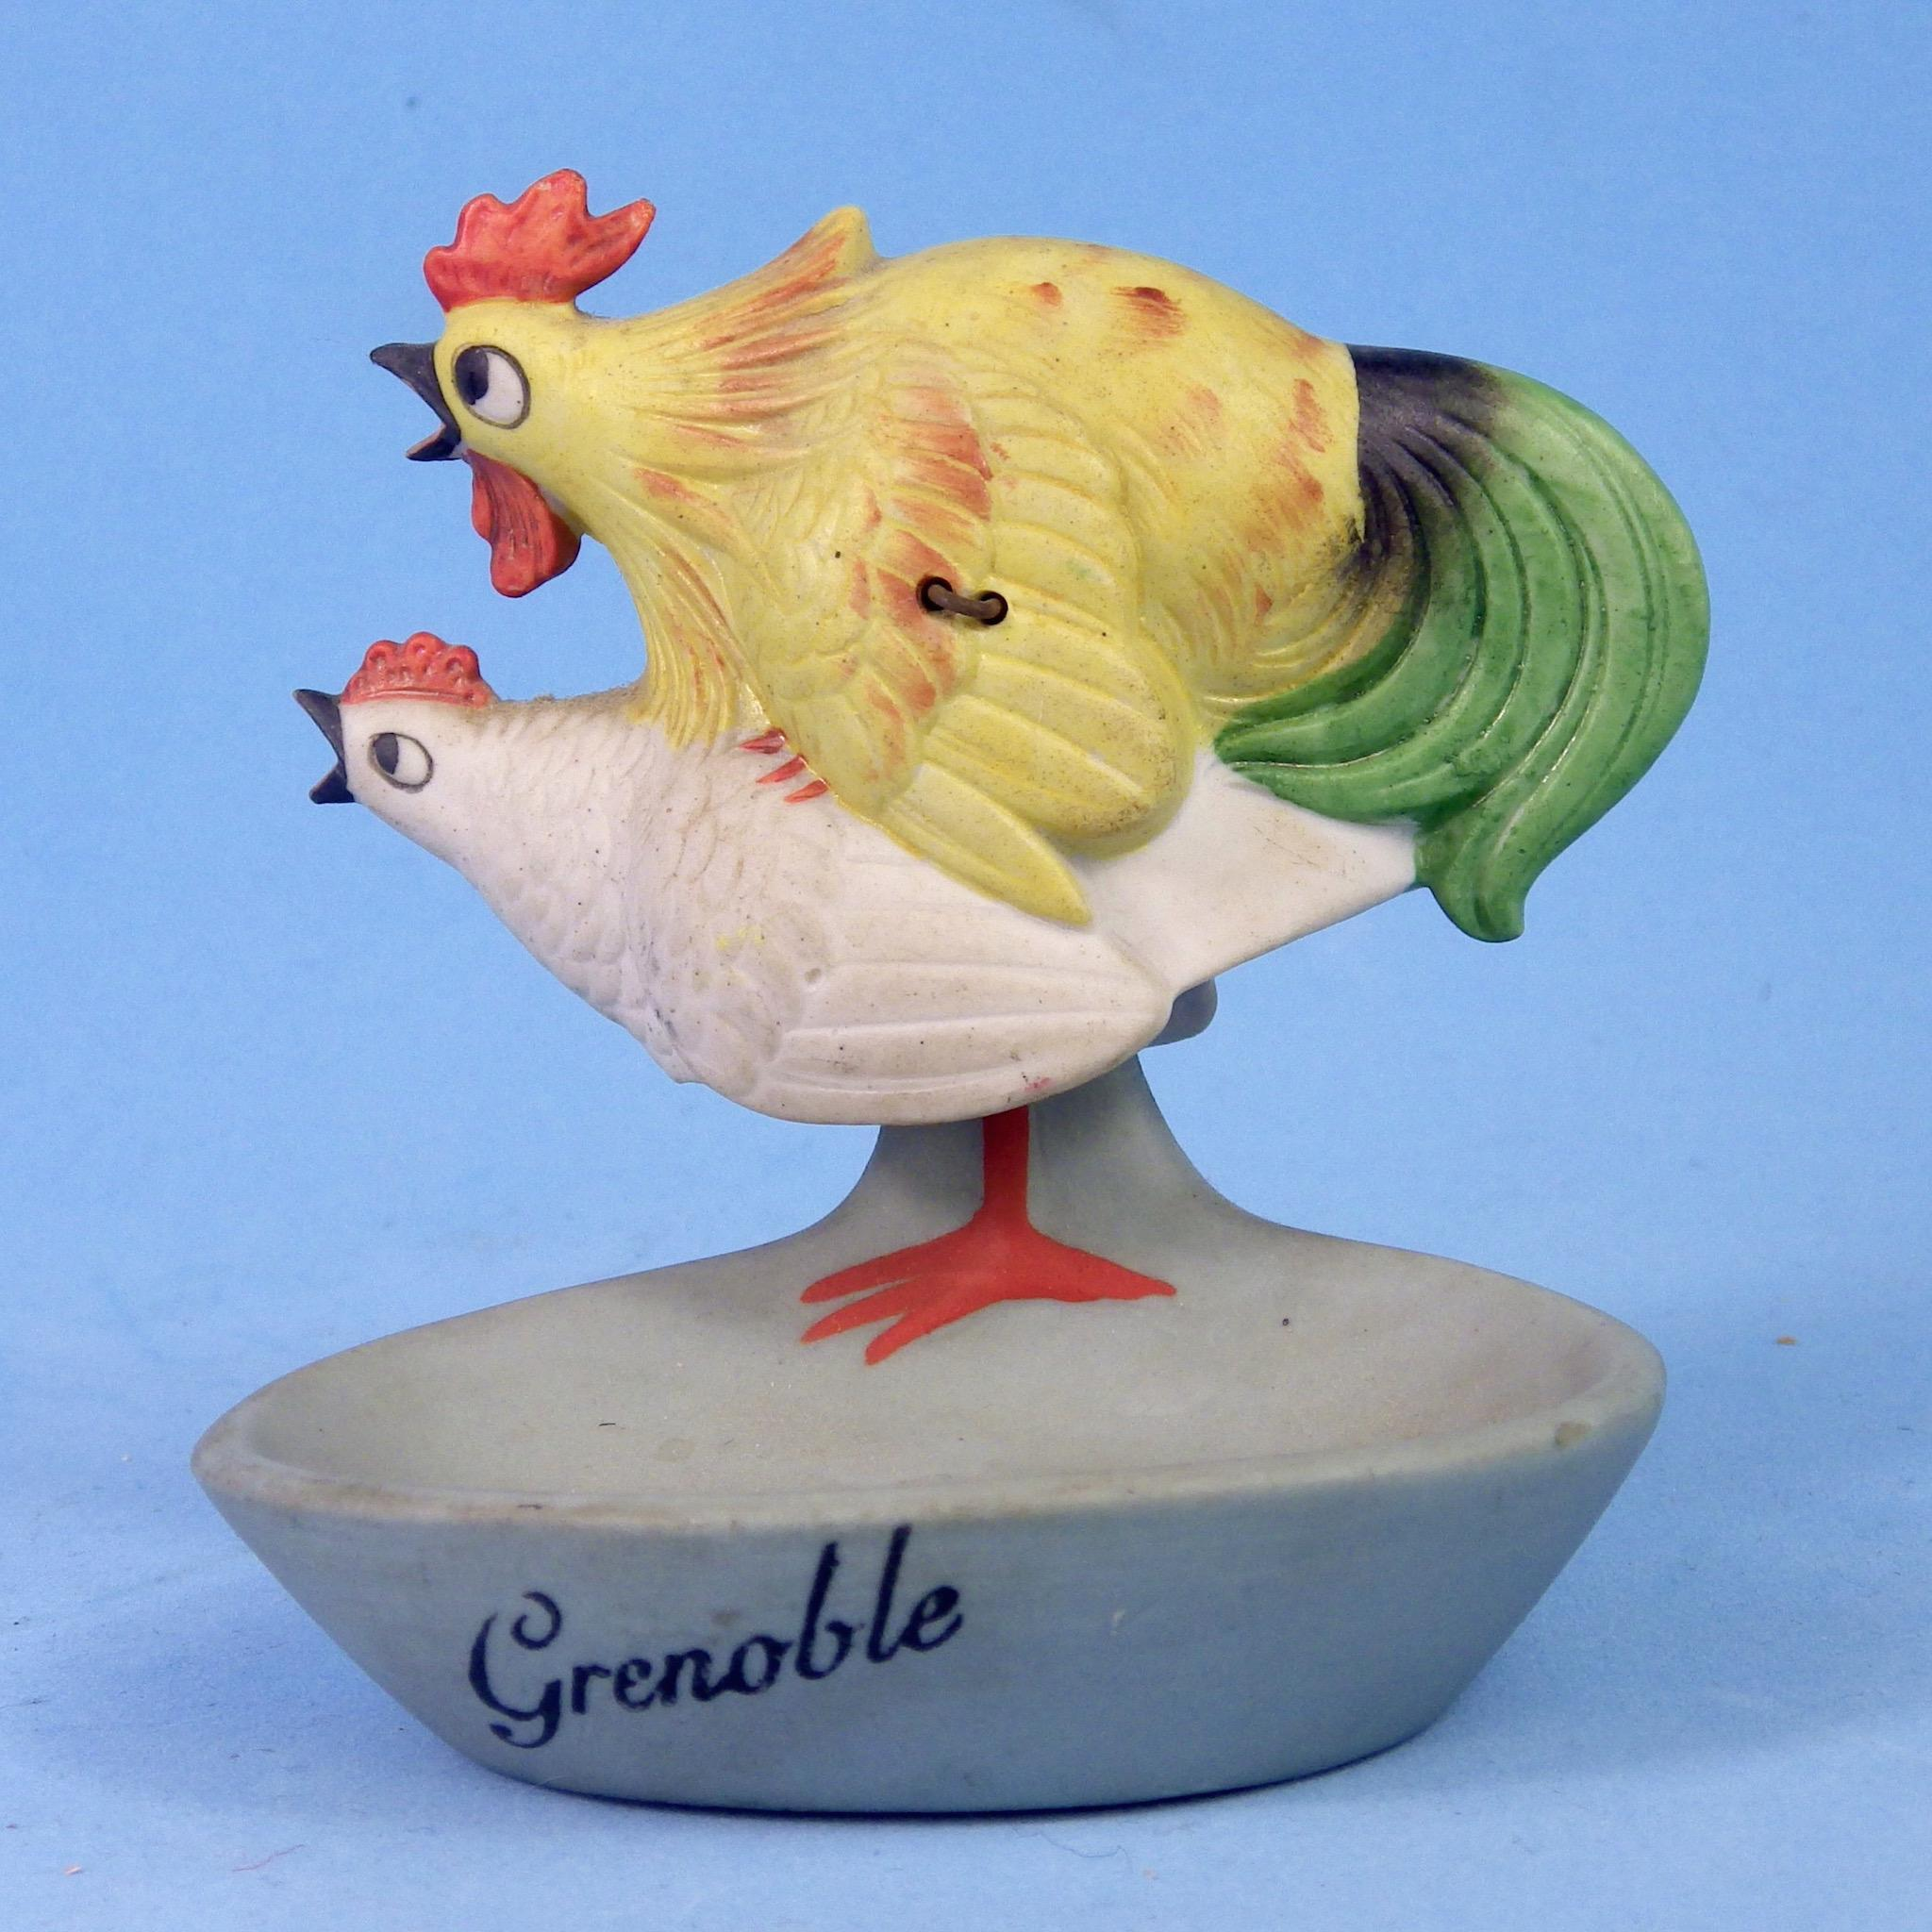 Schafer & Vater Naughty Nodder of Mating Chickens